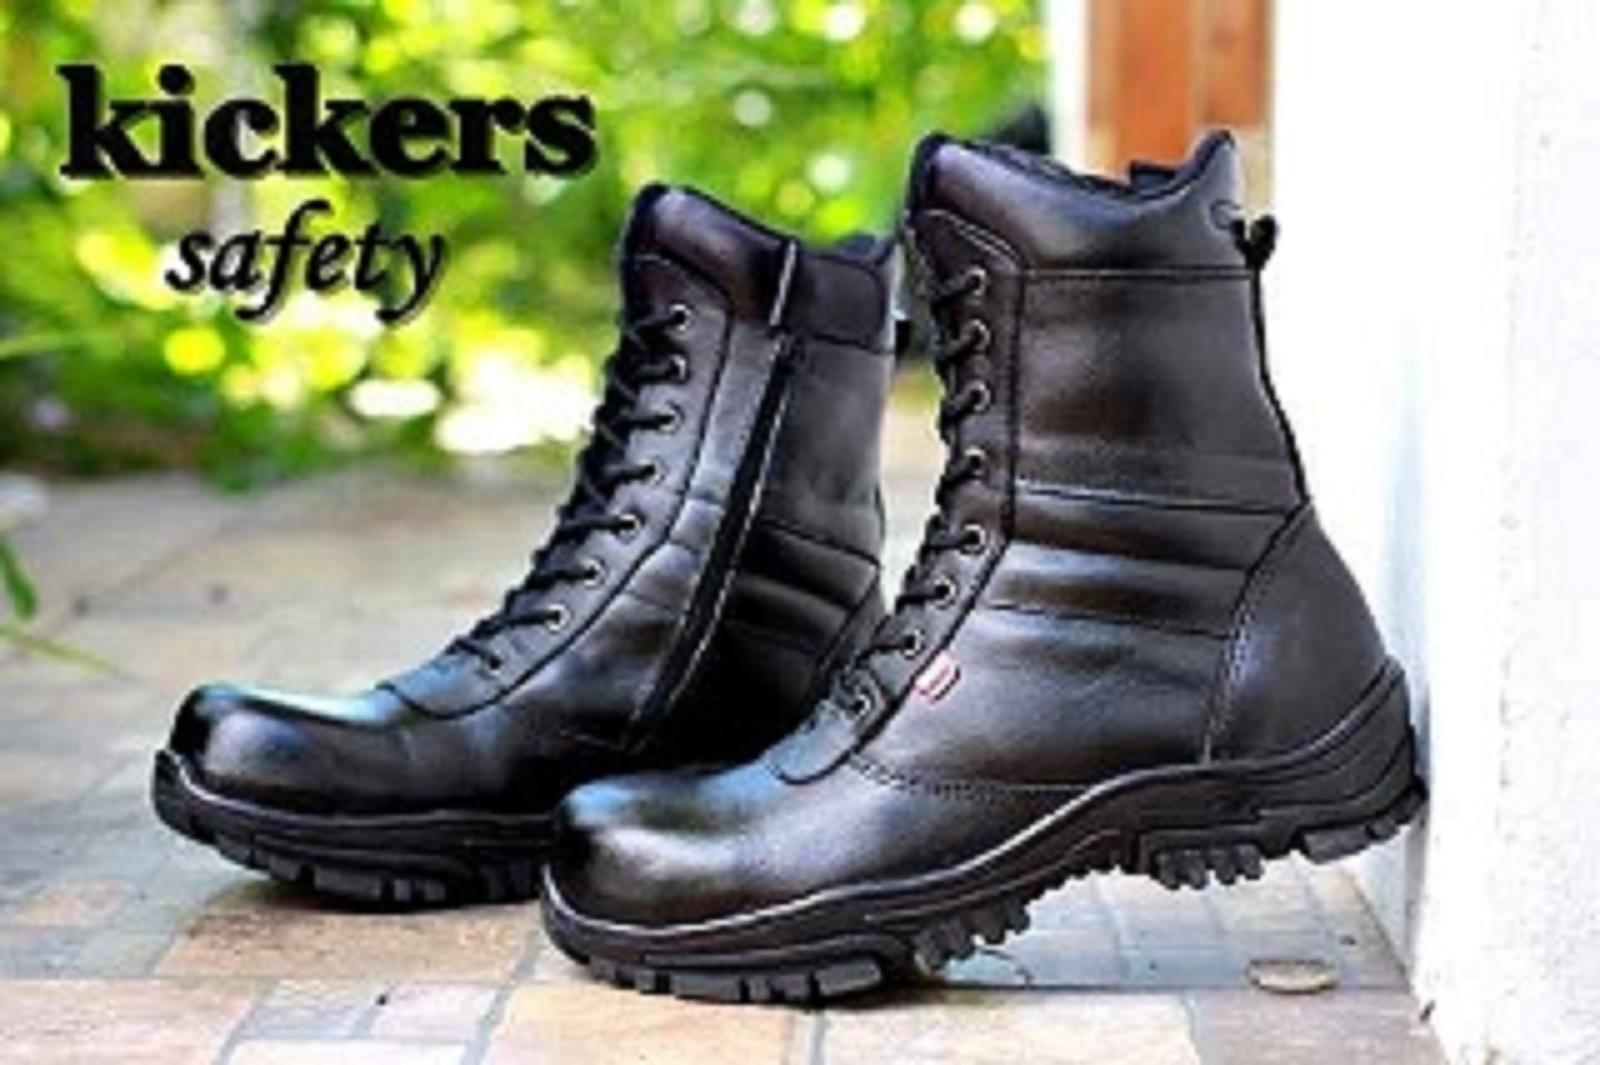 Sepatu Boots Delta Safety High PDL PDH TNI POLRI SECURITY Size 39-44 Kulit Asli Sepatu Bikers / Touring / Tracking / Hiking